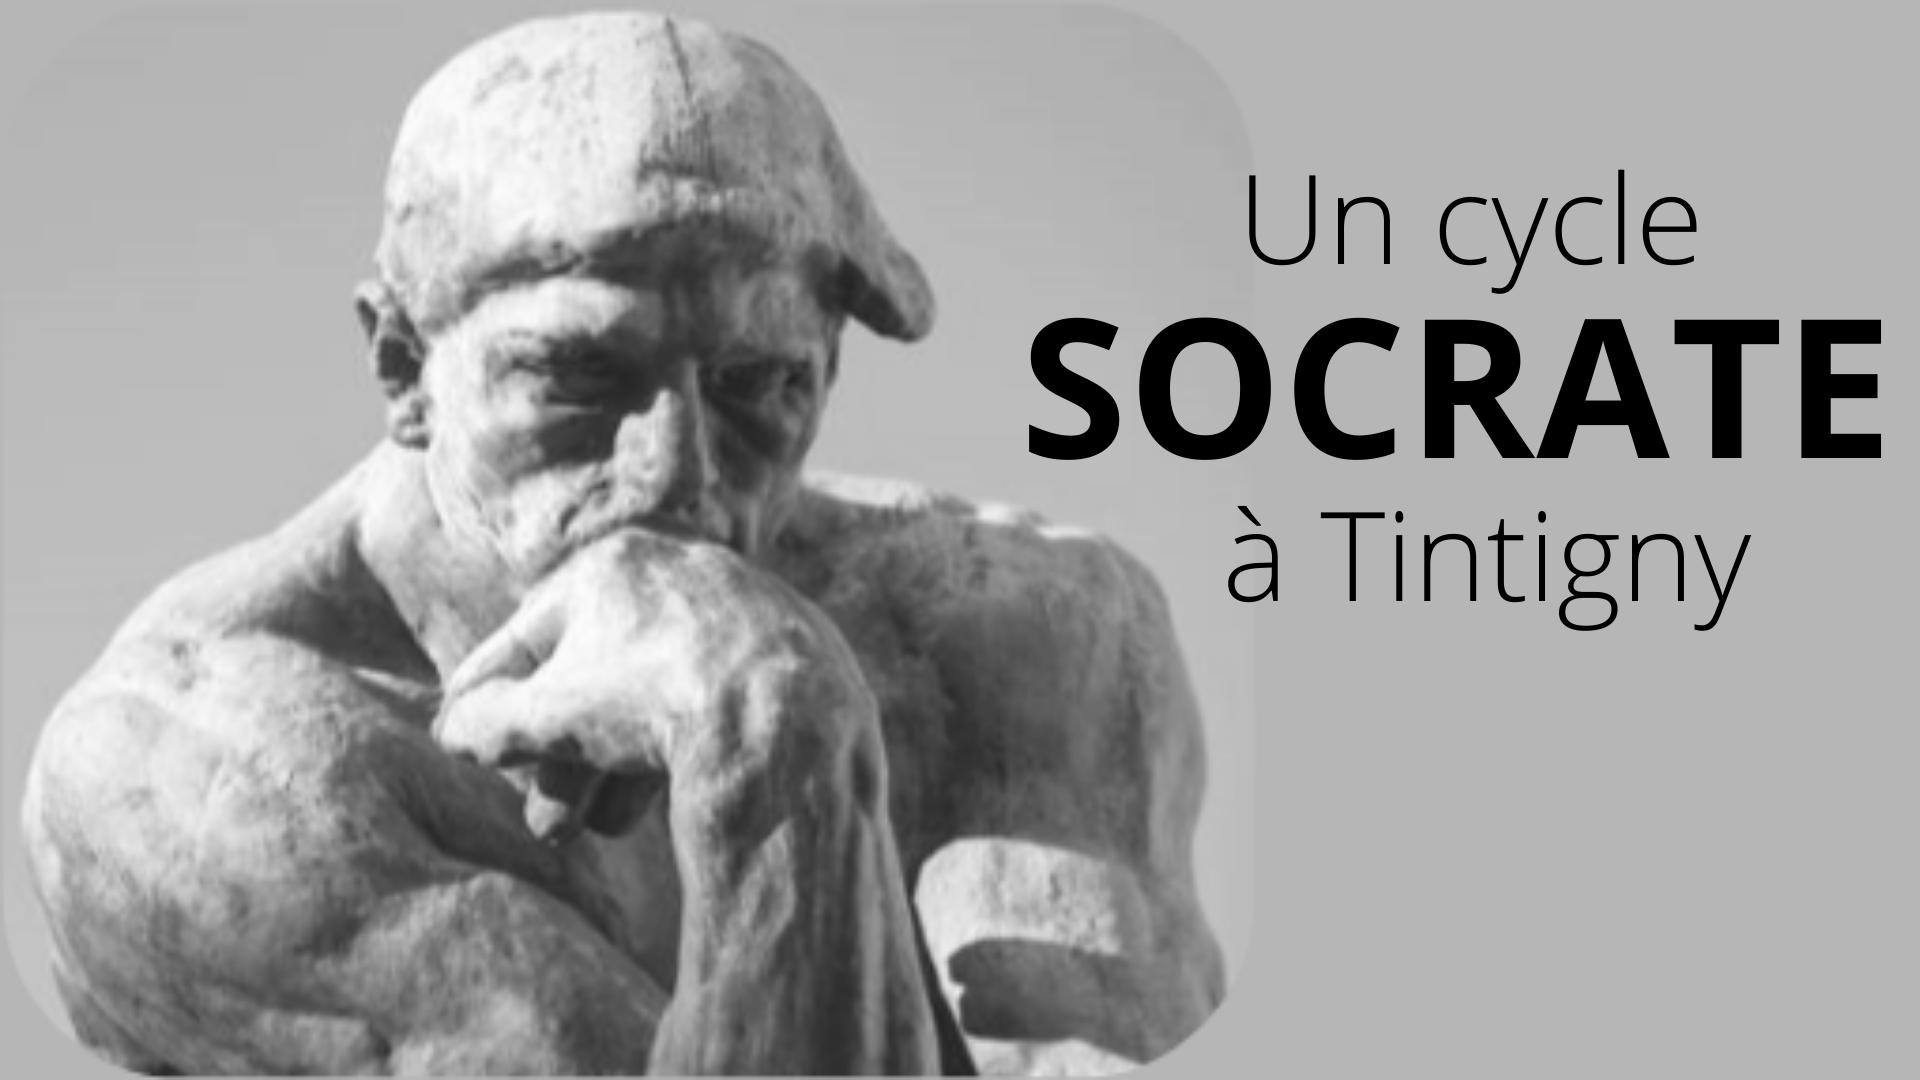 Socrate tintigny